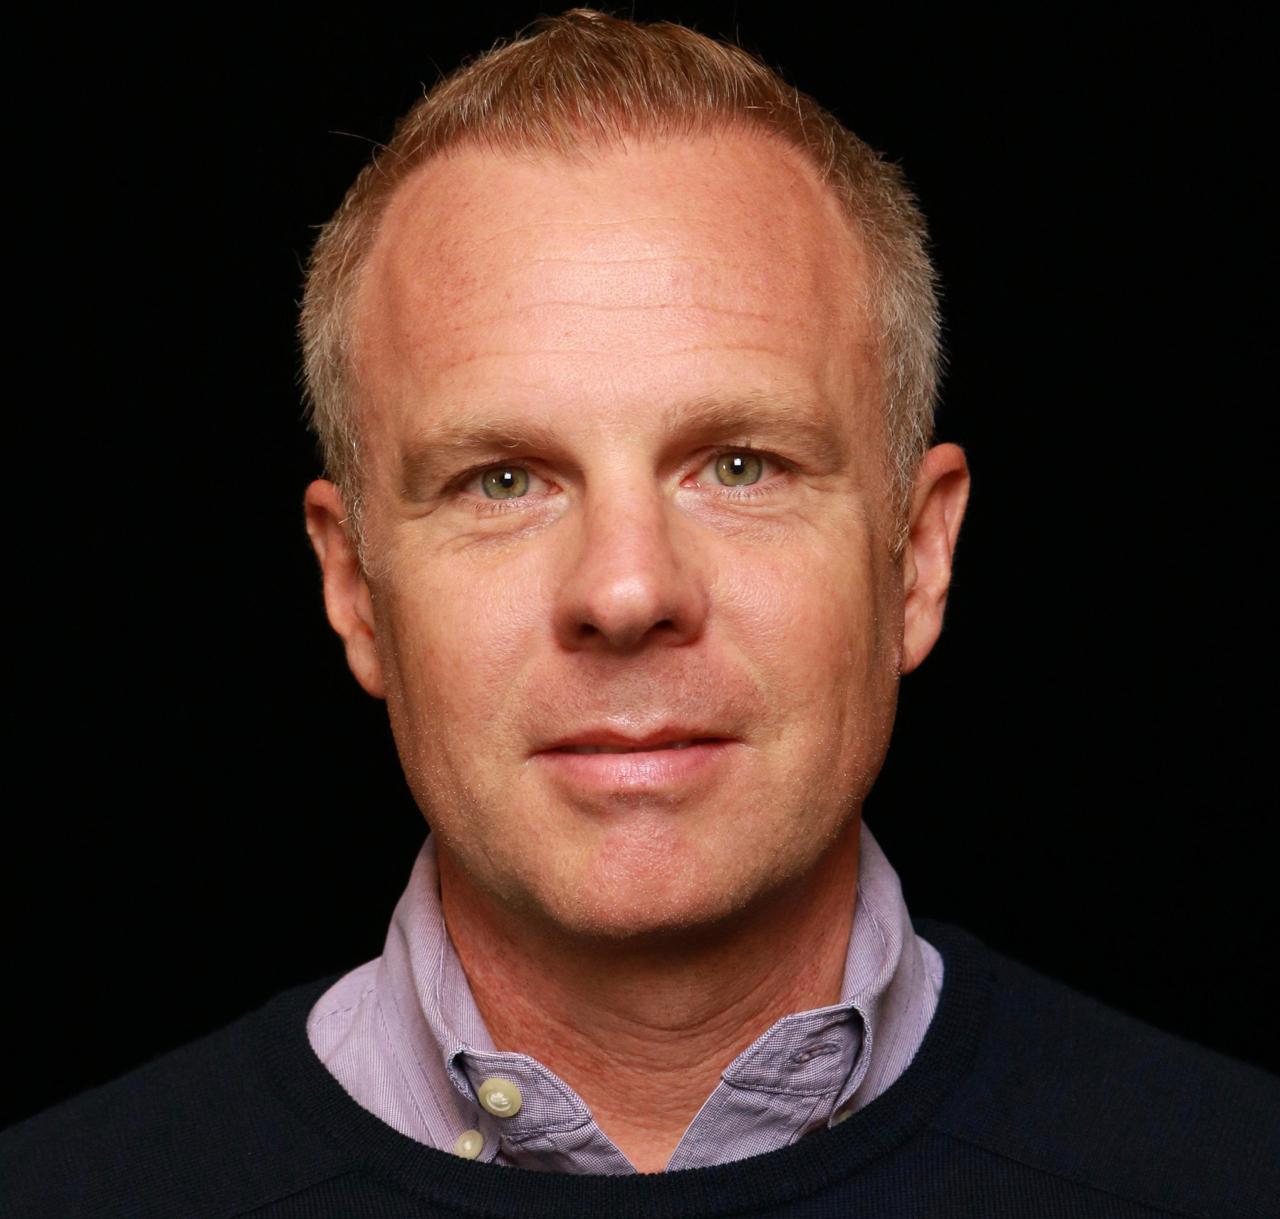 Philip Potloff